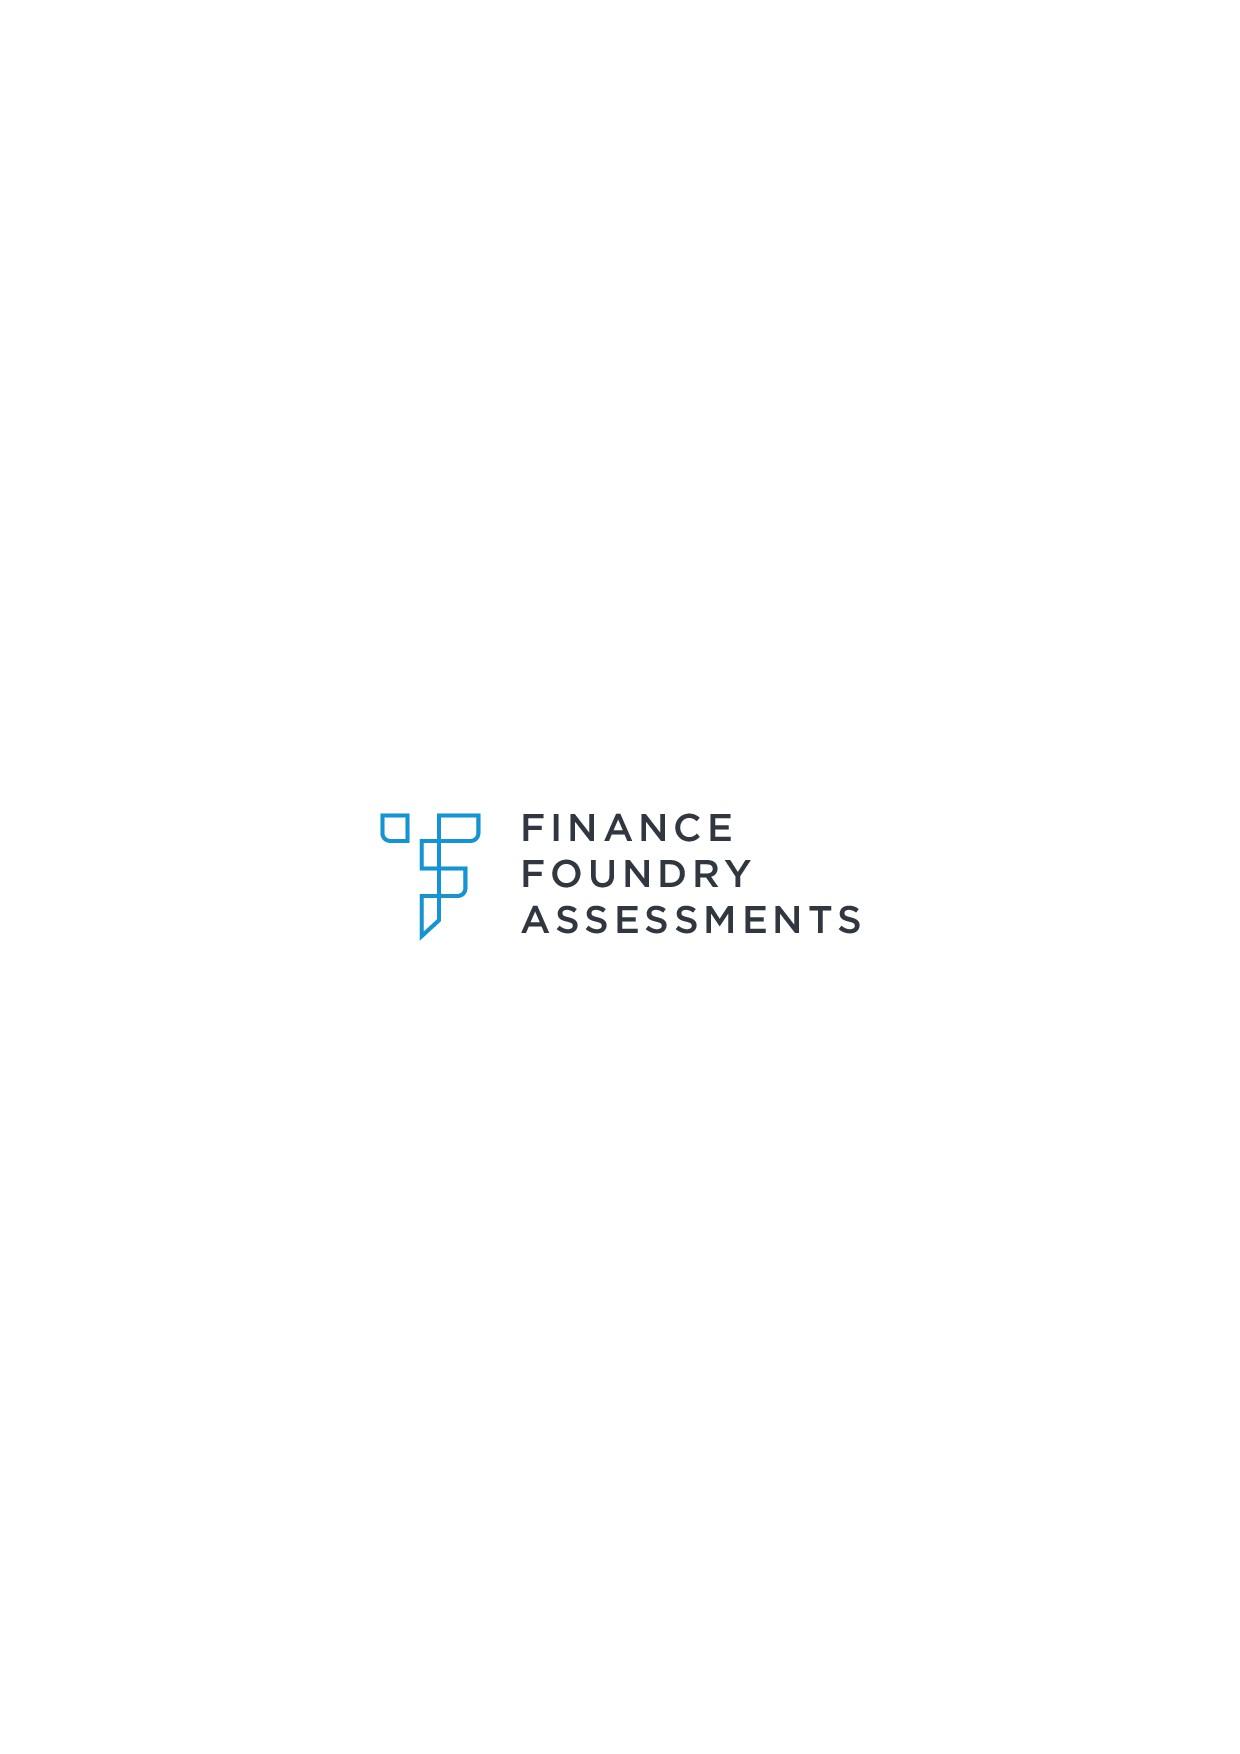 Finance Foundry Assessments logo